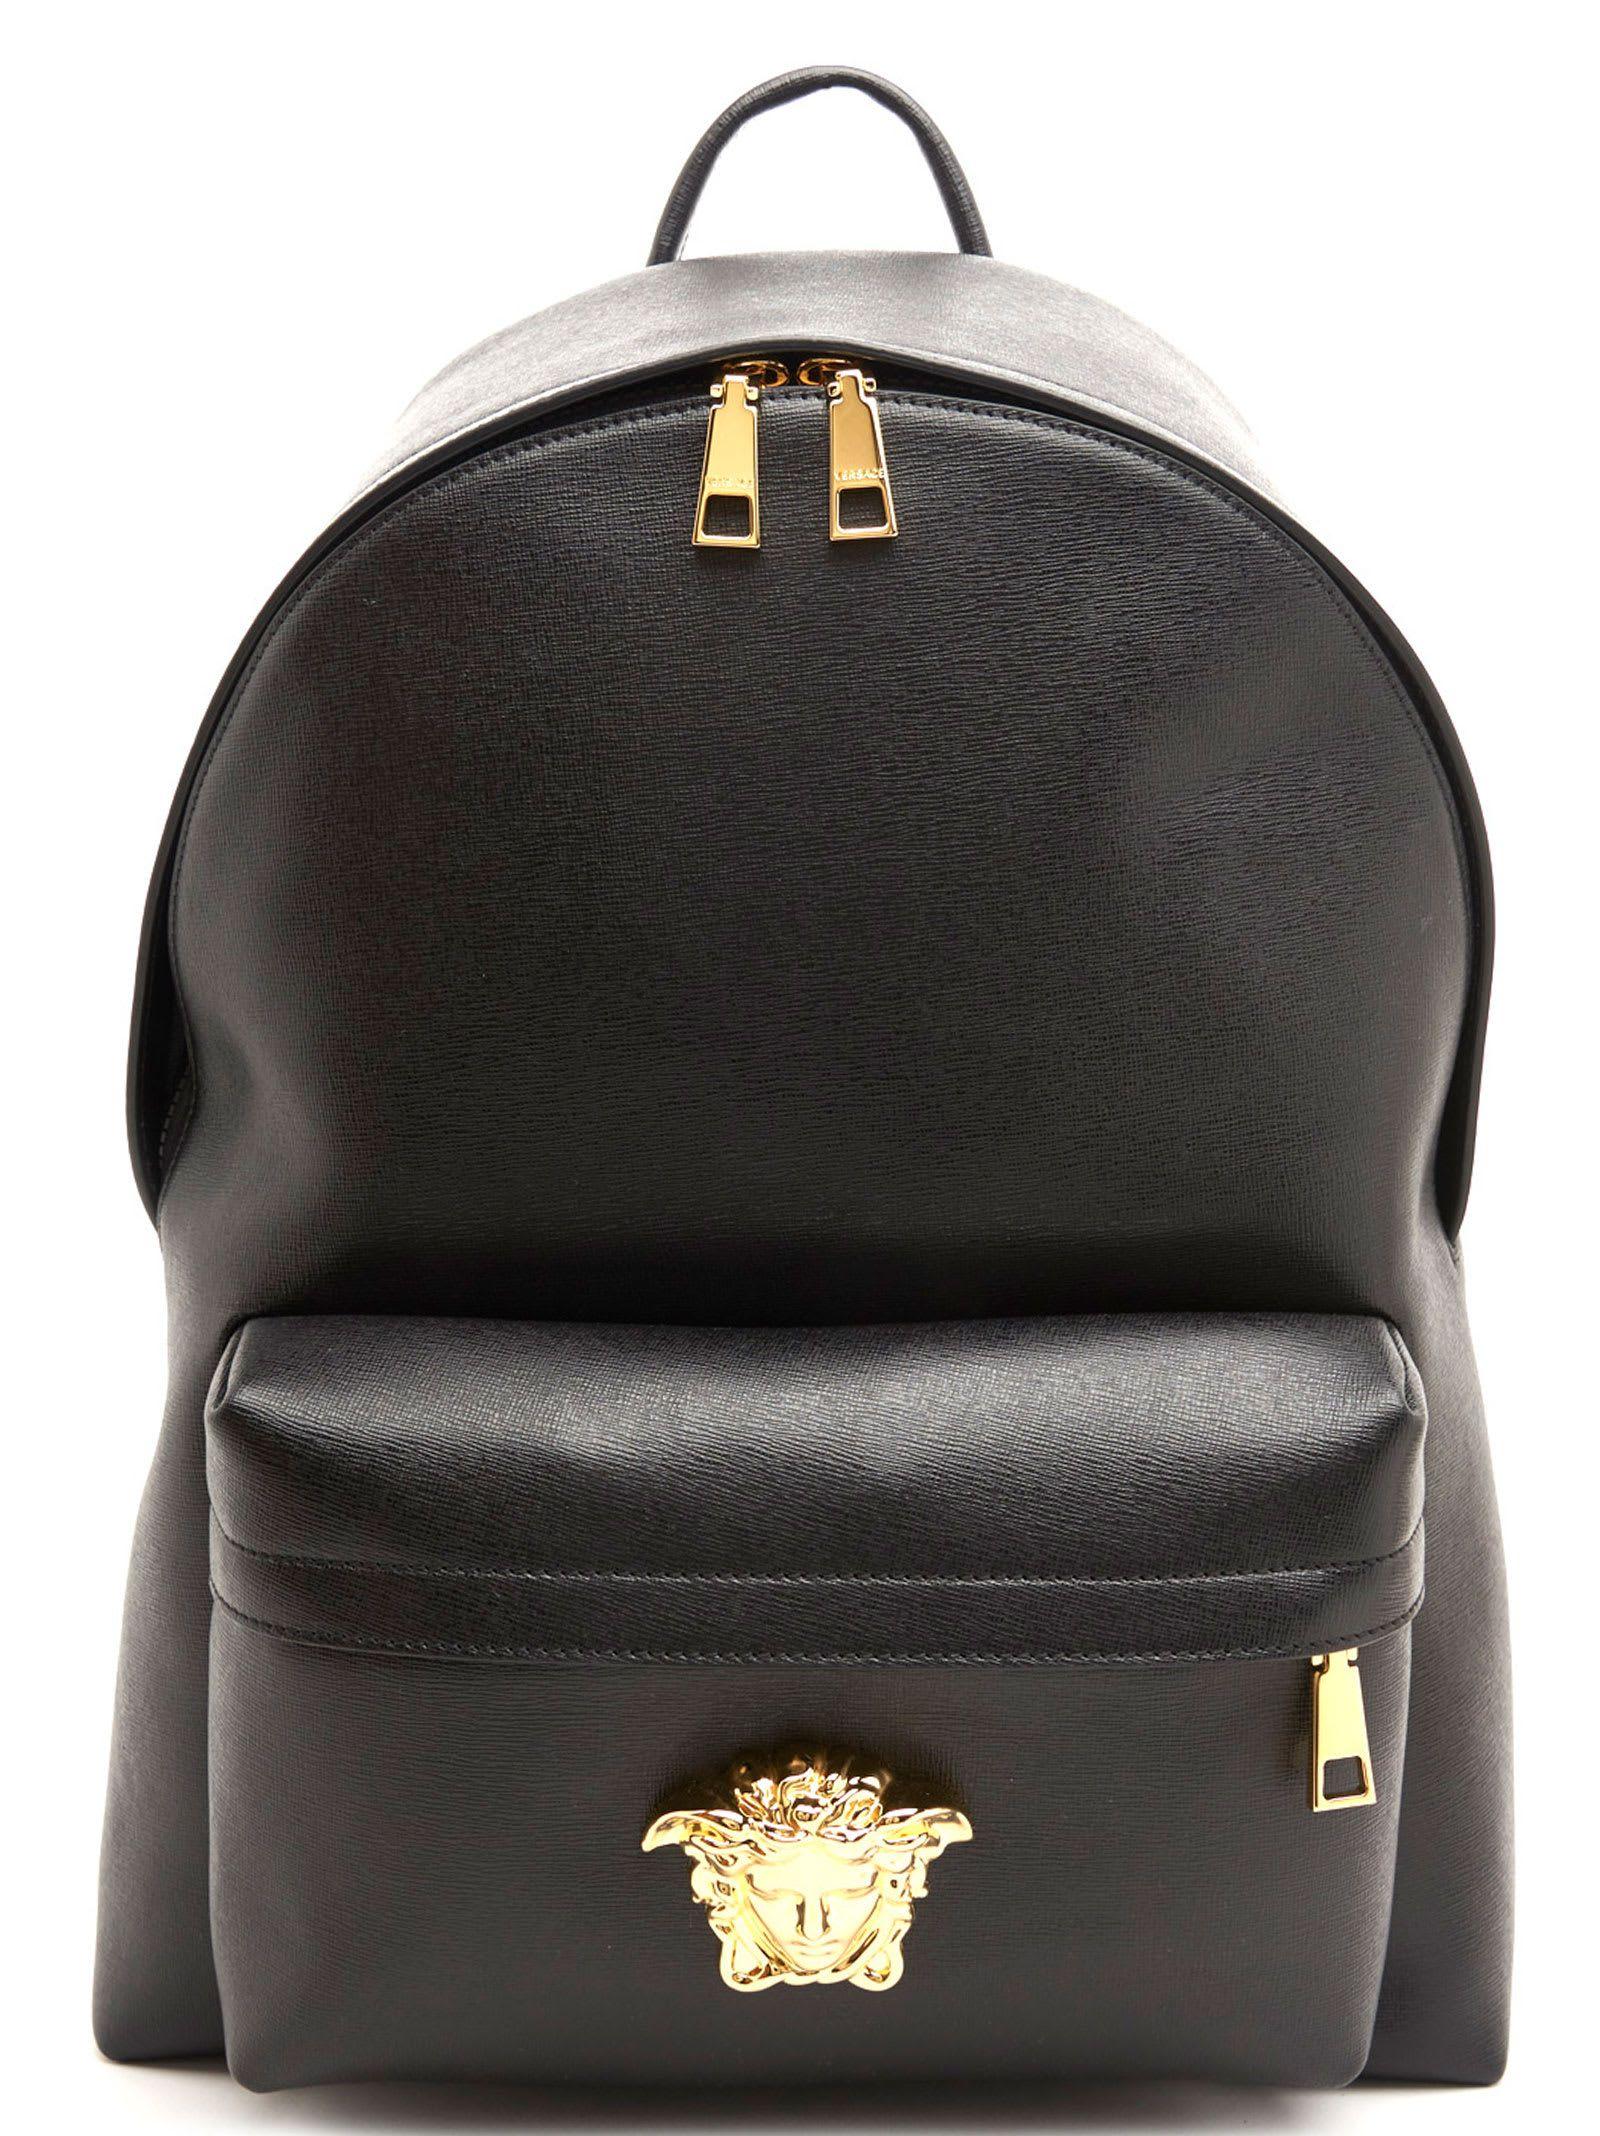 Park Art My WordPress Blog_Versace Gift Set With Backpack